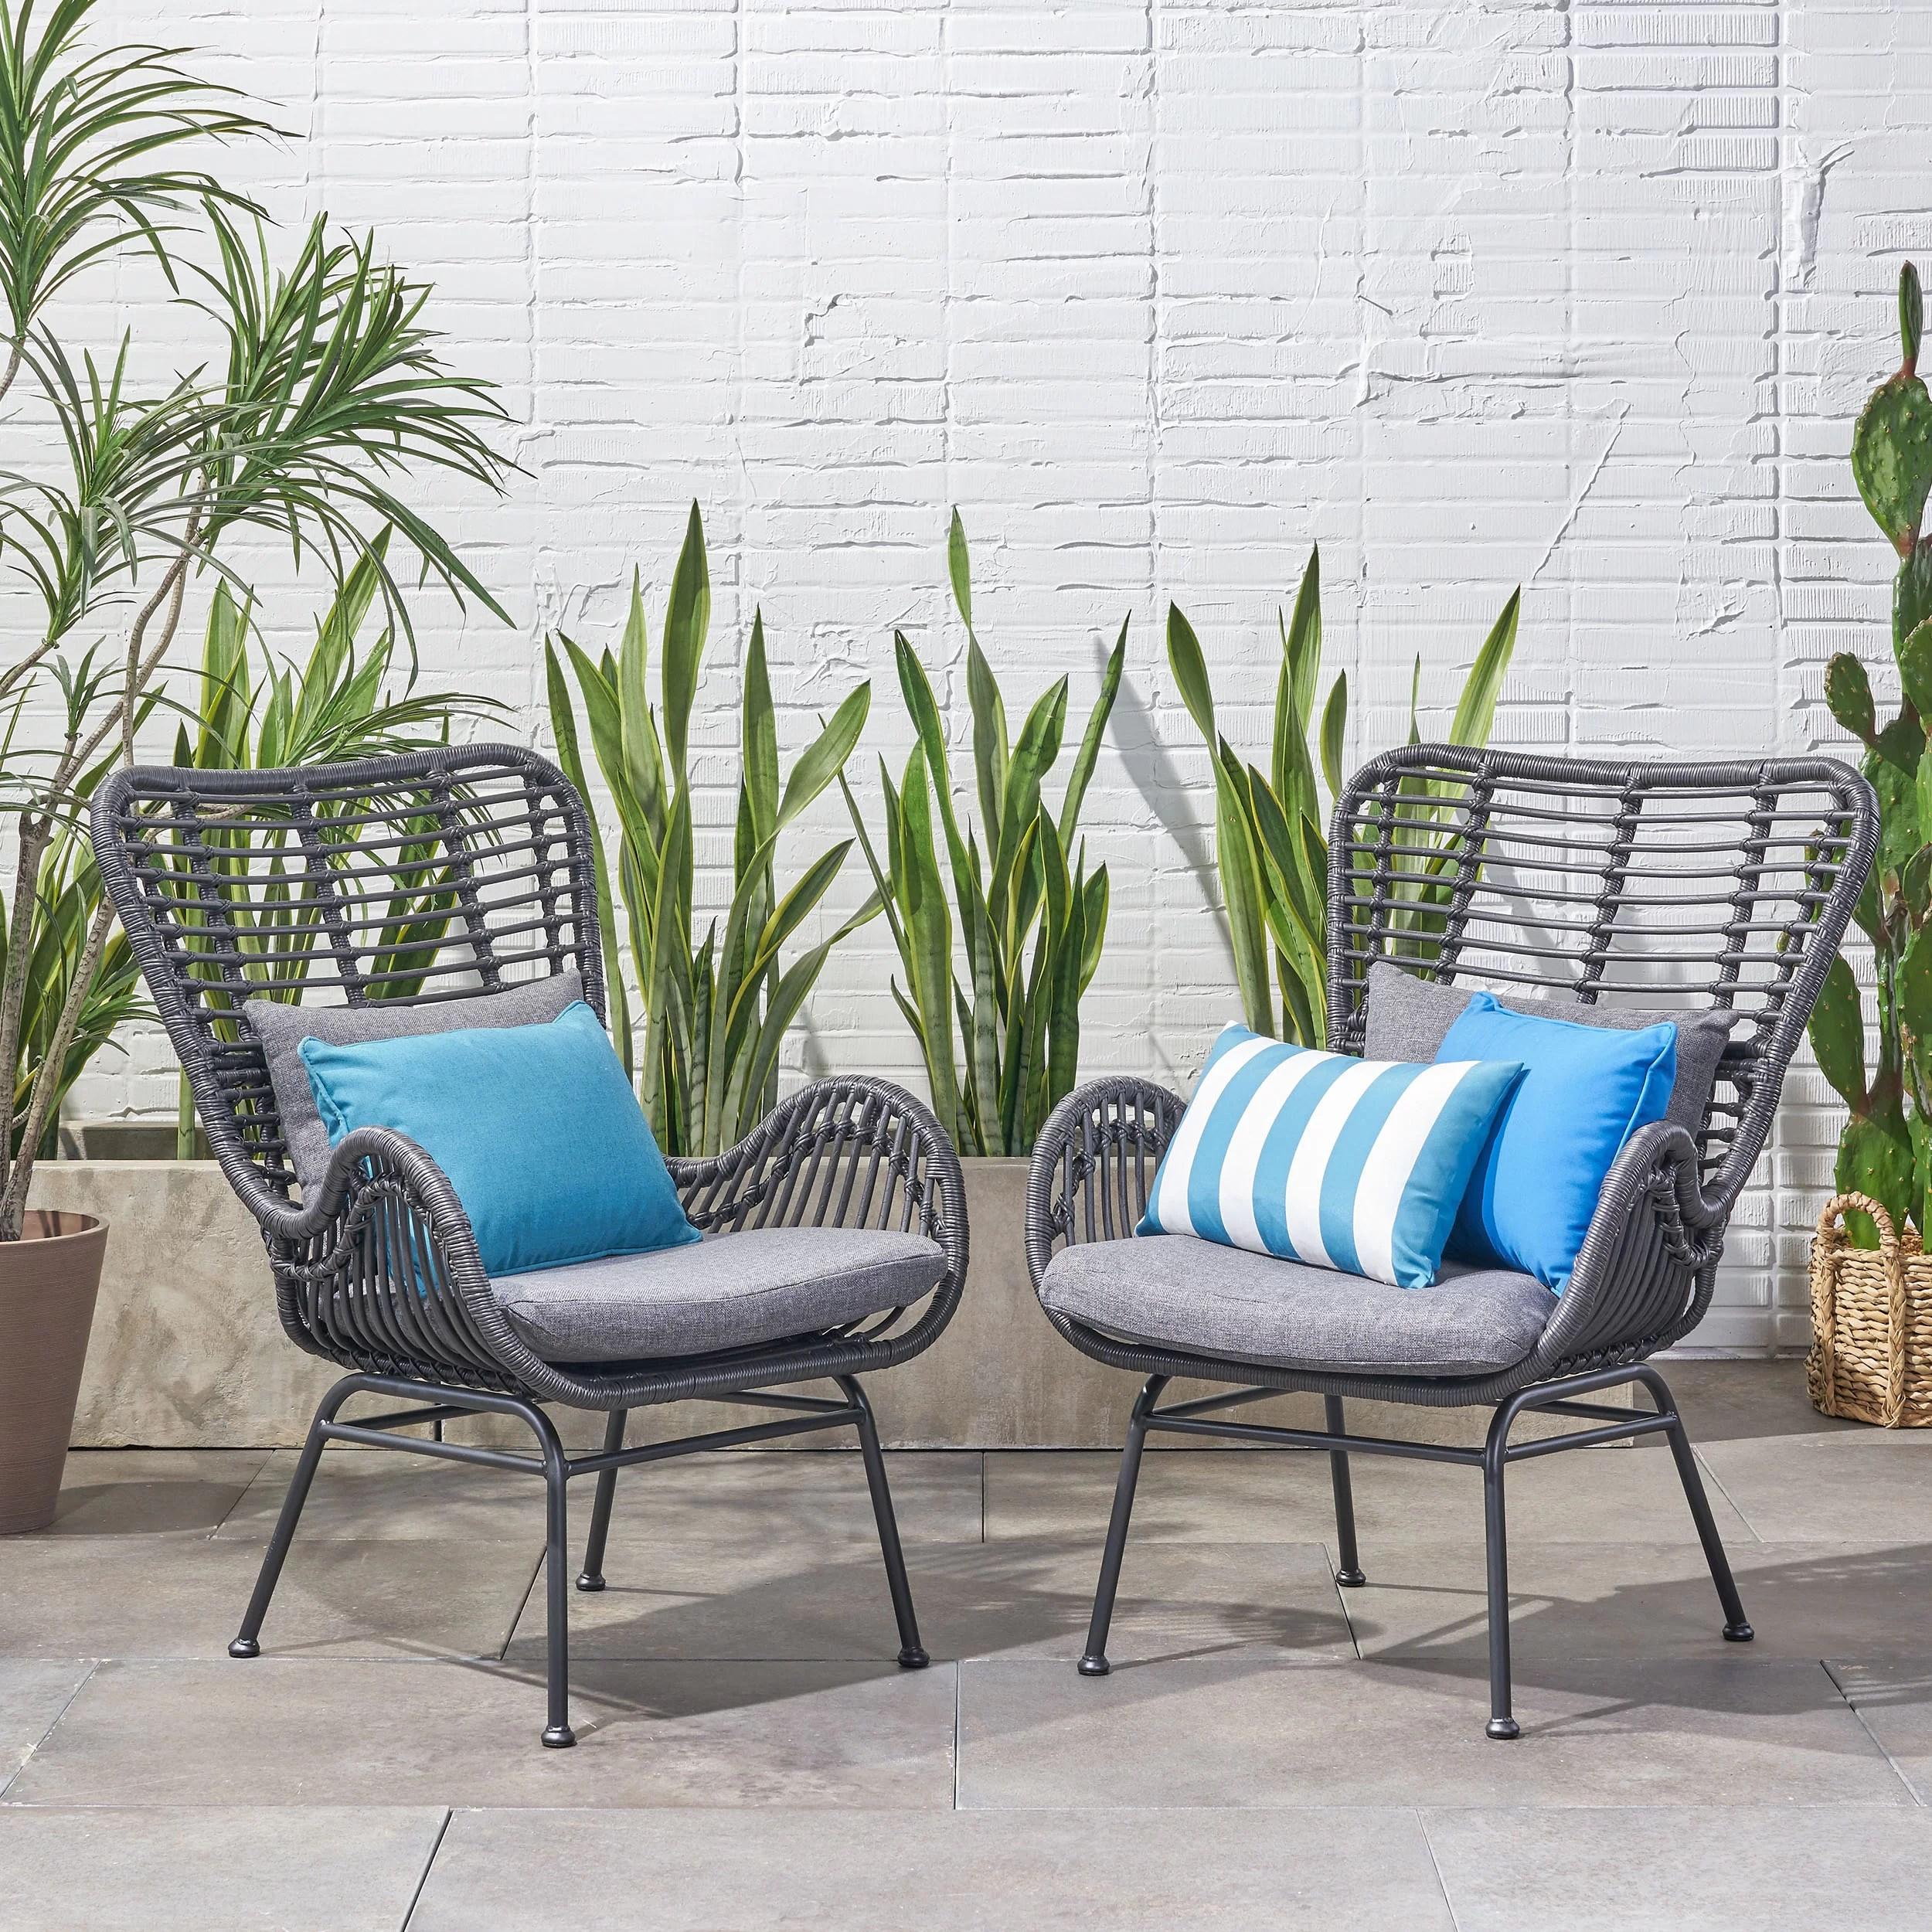 tapscott wicker patio chair with cushions